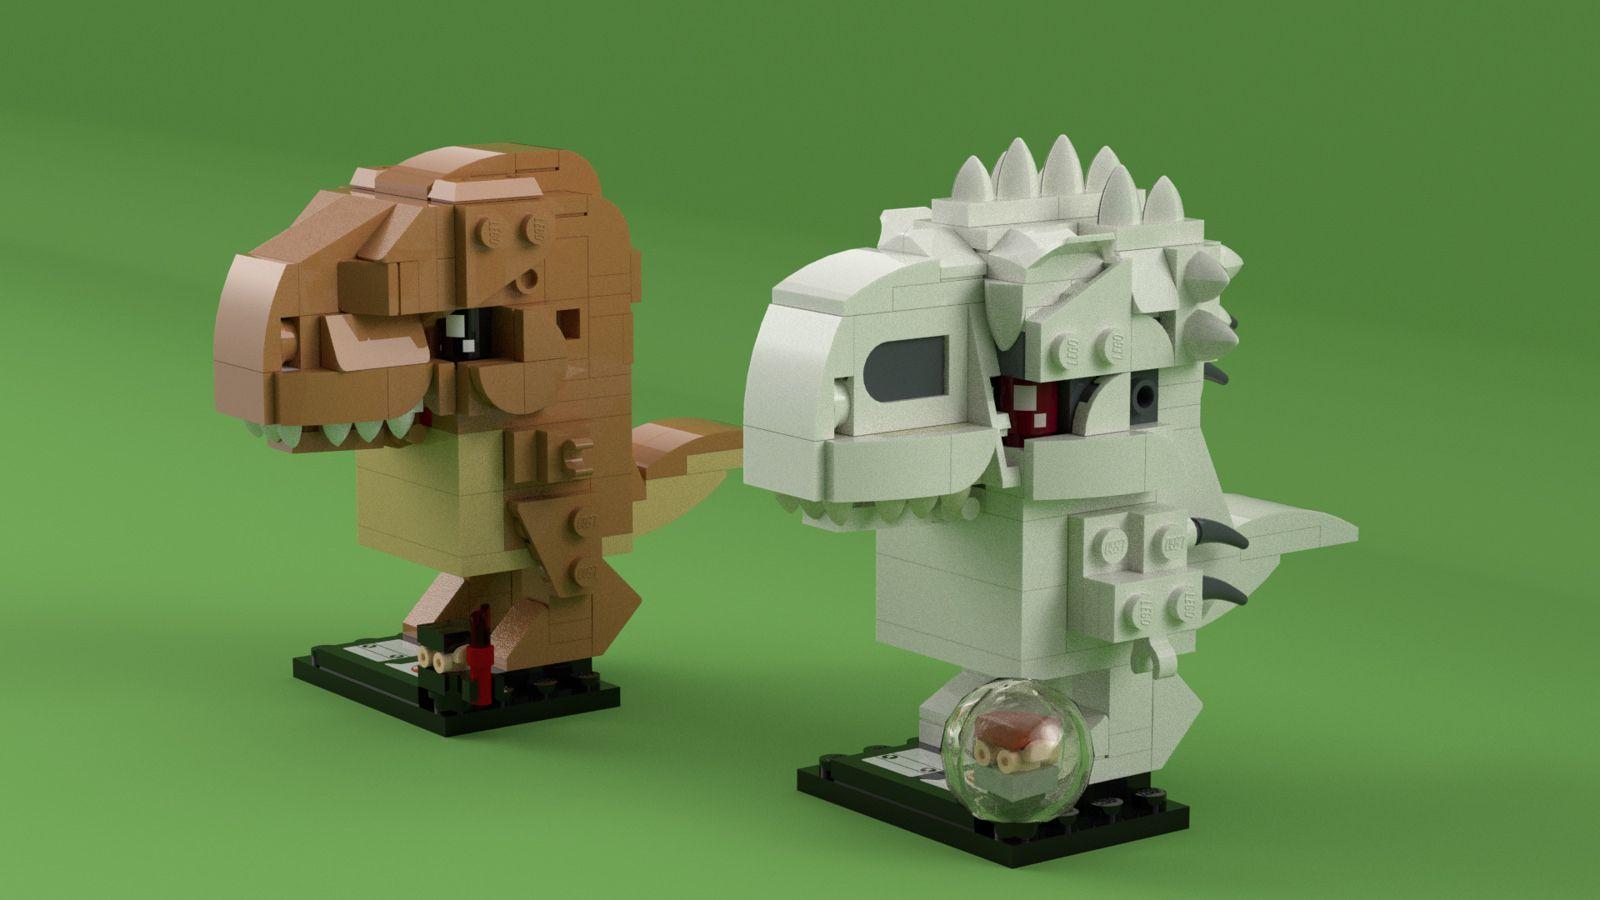 LDD] BrickHeadz Jurassic Park/World: Rexy & Indominus Rex